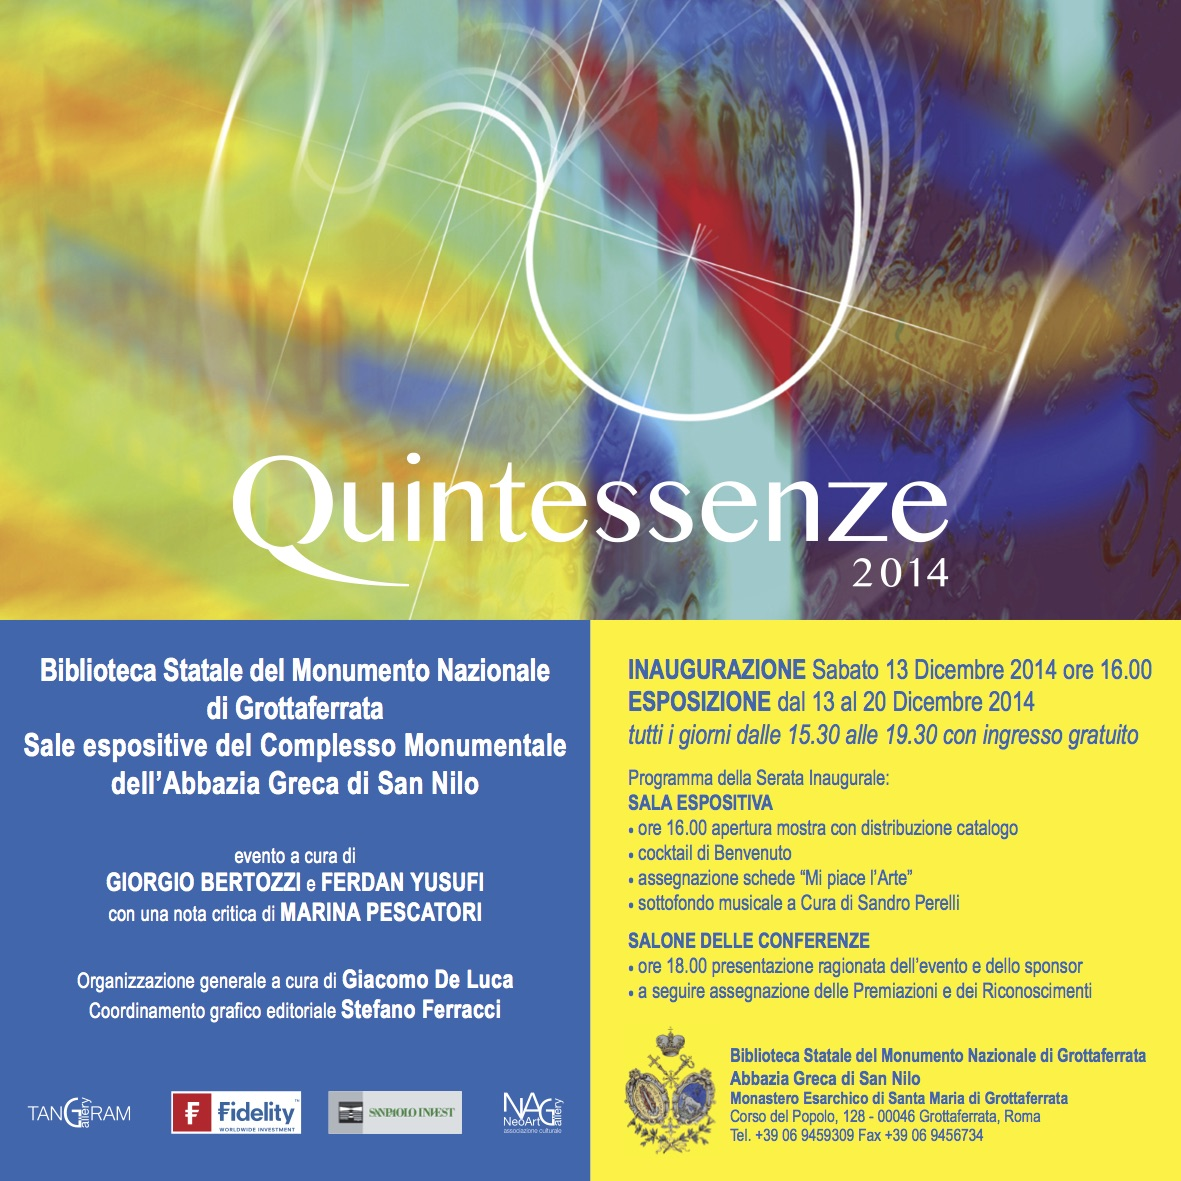 Quintessenze 2014